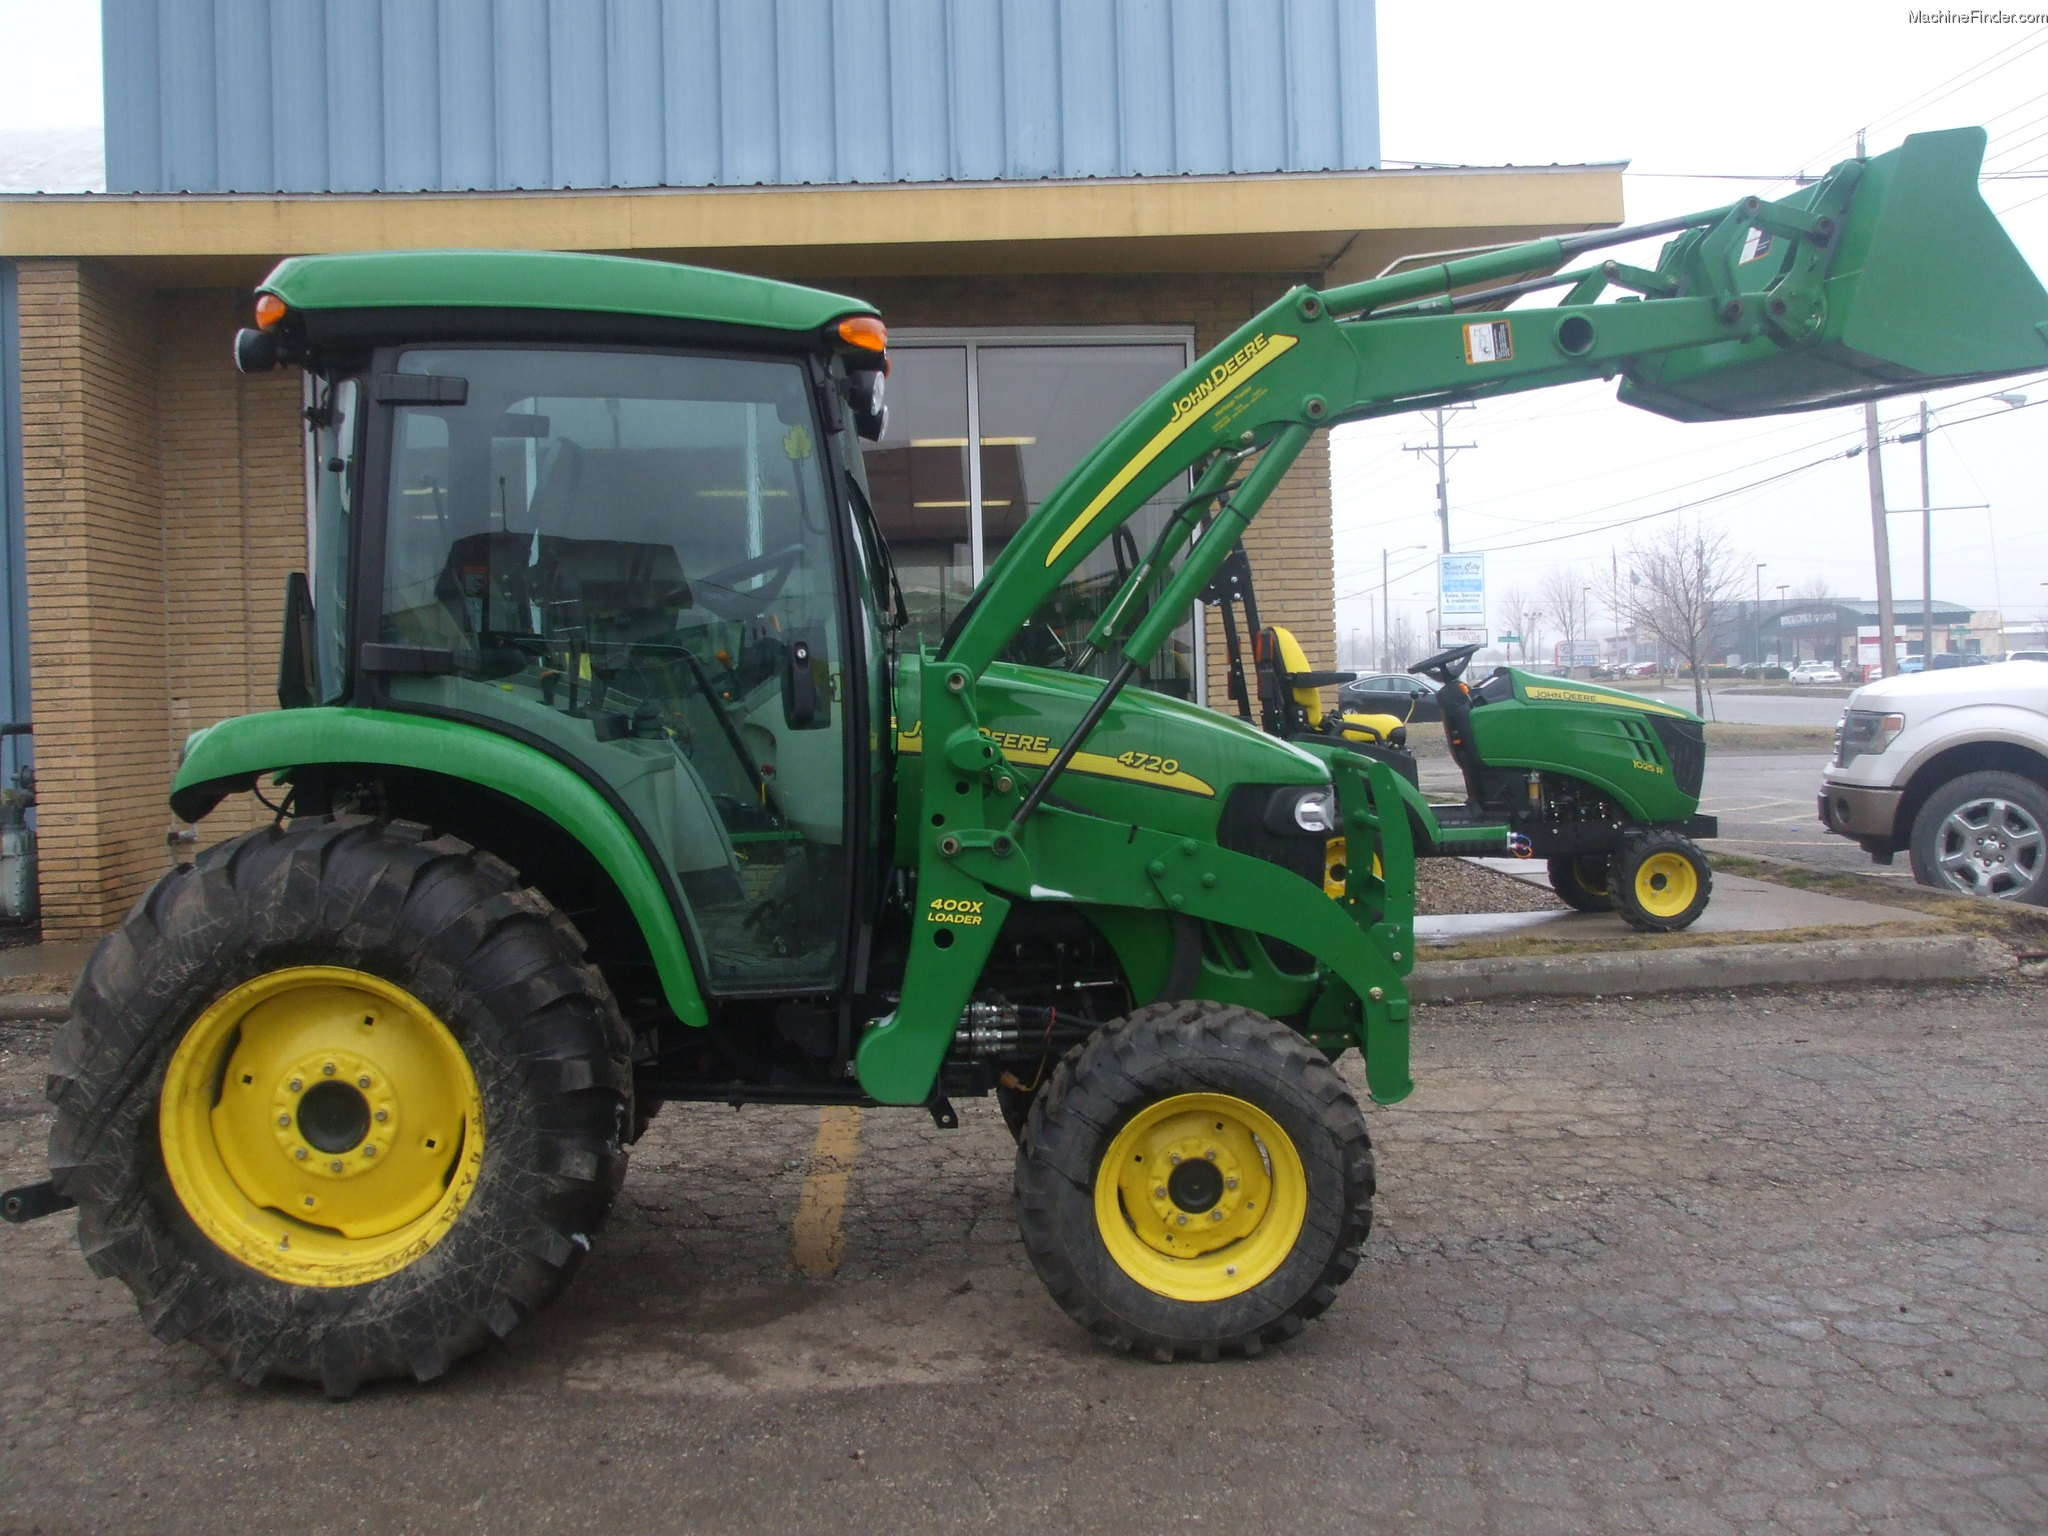 2008 John Deere 4720 Tractors - Compact (1-40hp.) - John ...